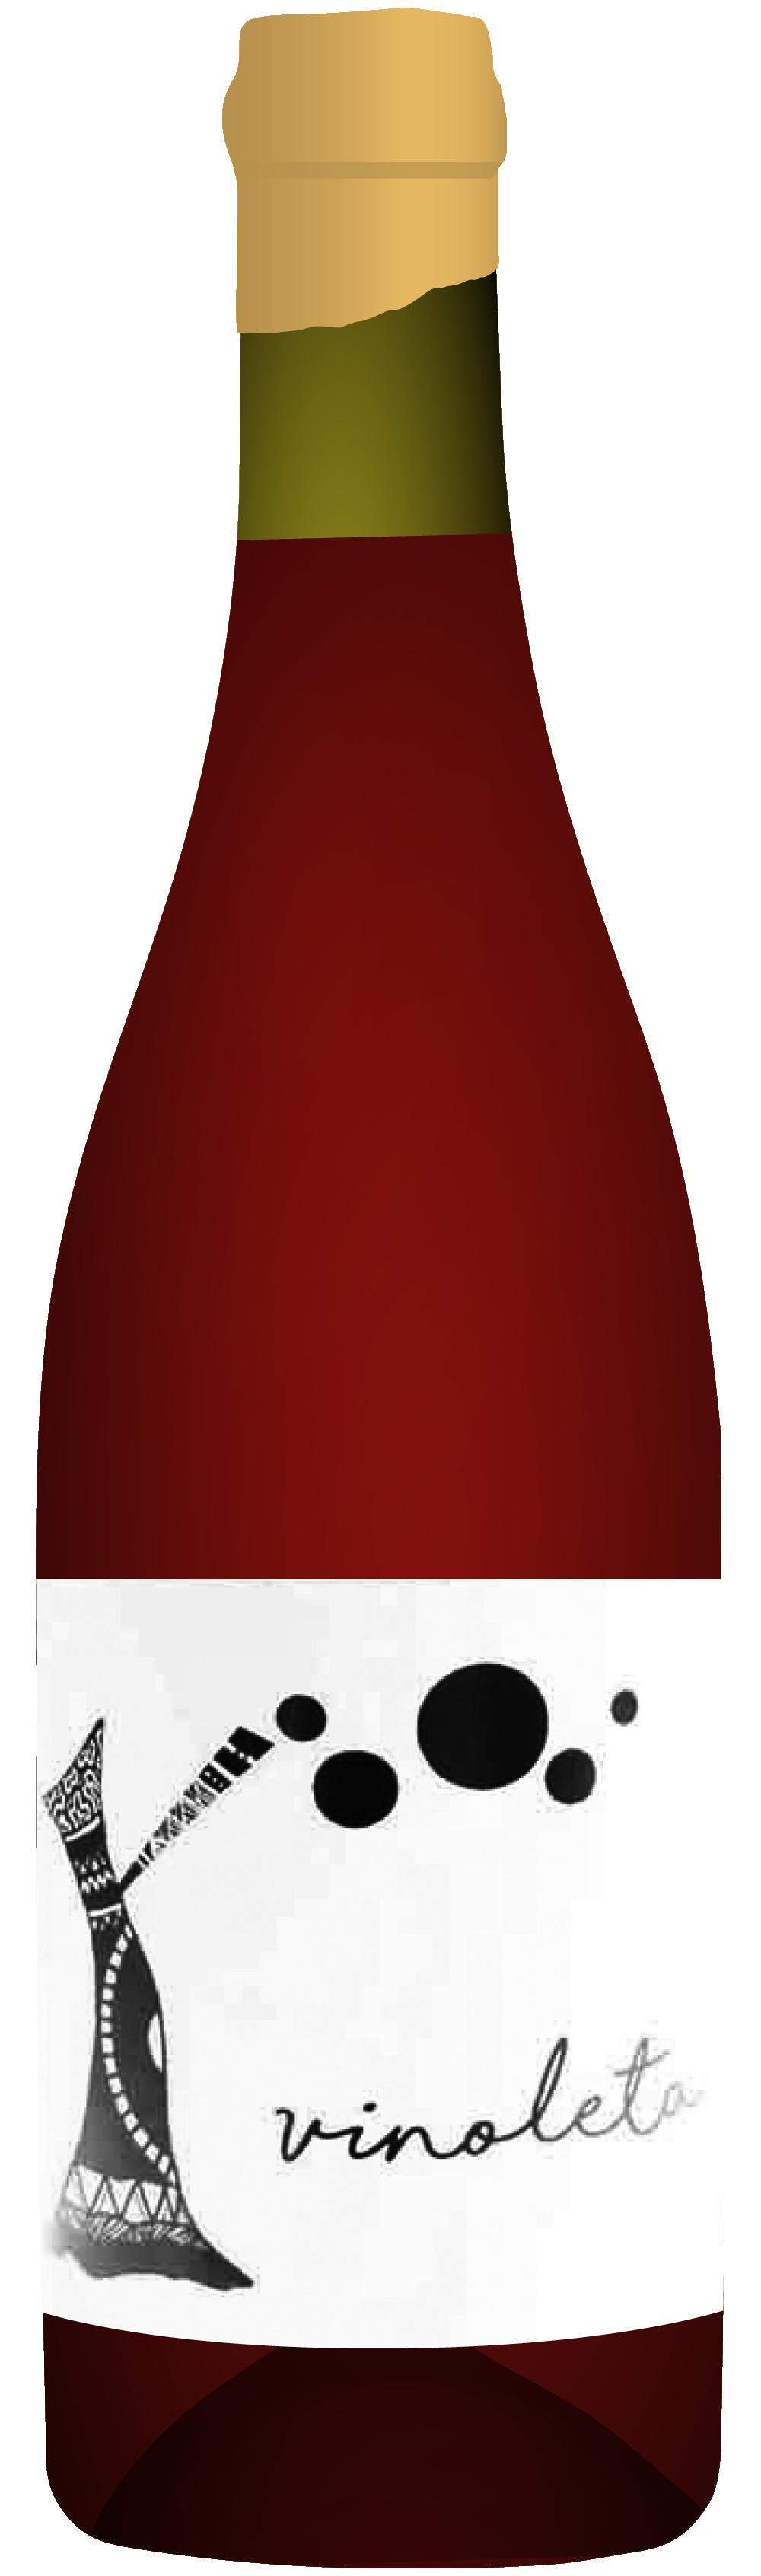 the natural wine company club july 2021 spain punta flecha la vinoleta